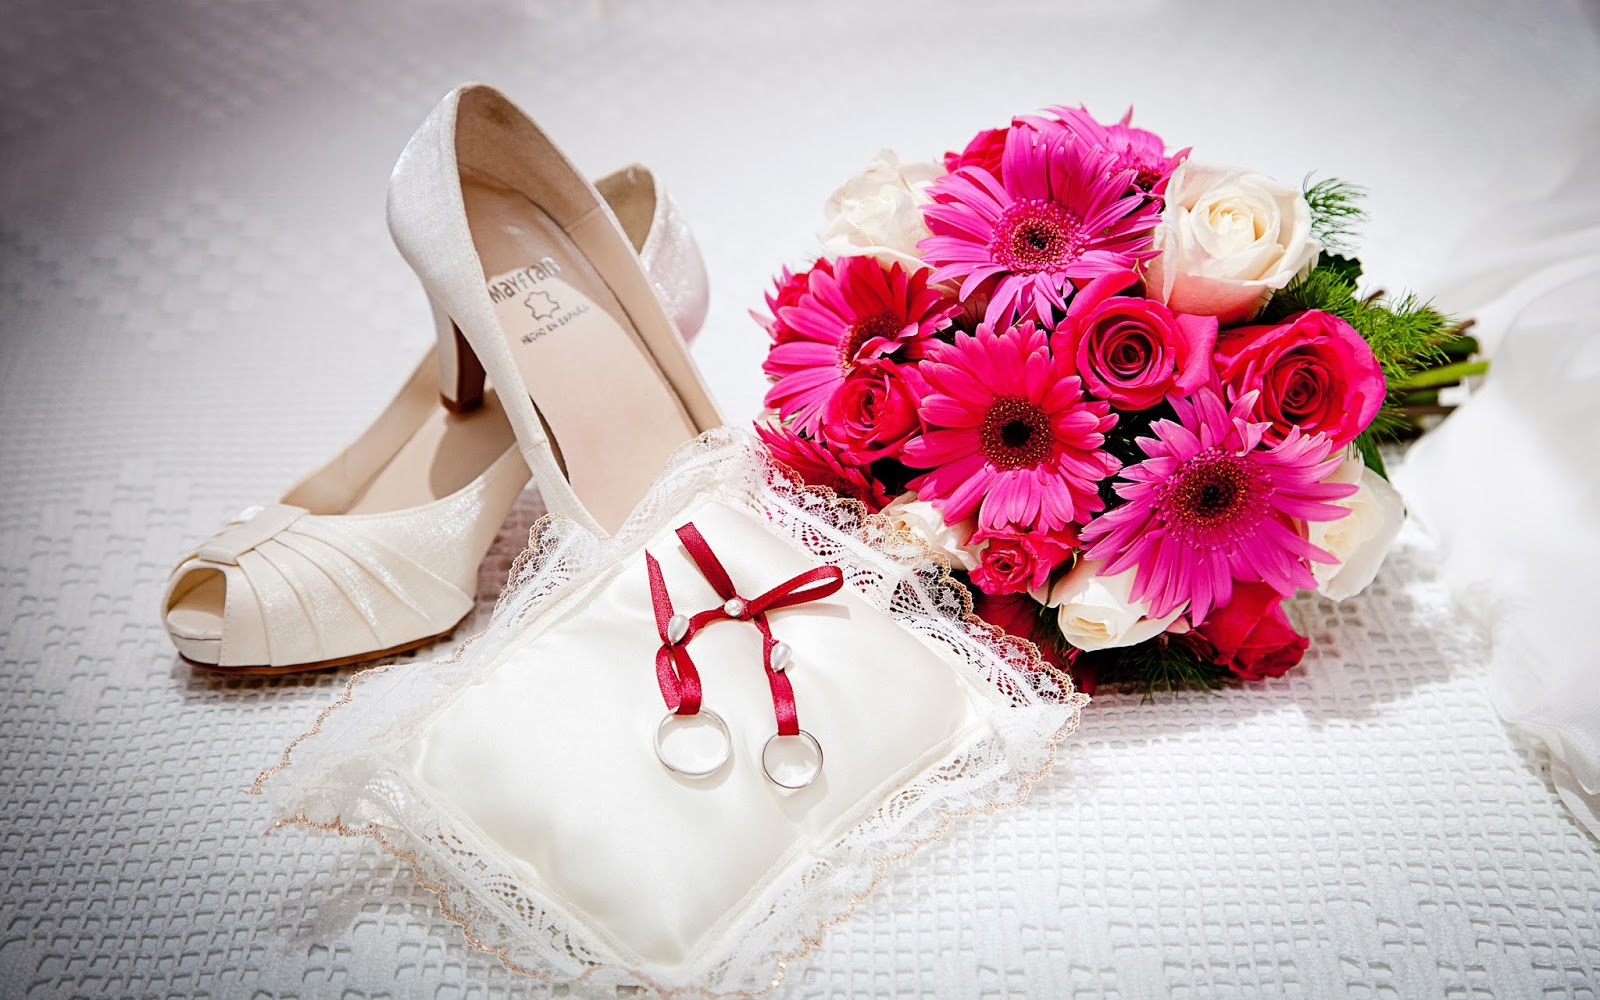 "<img src=""http://2.bp.blogspot.com/-hfUsgDhWKIo/UuqwjhKjZSI/AAAAAAAAKuw/3nRPcAZKkY8/s1600/wedding-wallpaper.jpg"" alt=""wedding wallpaper"" />"